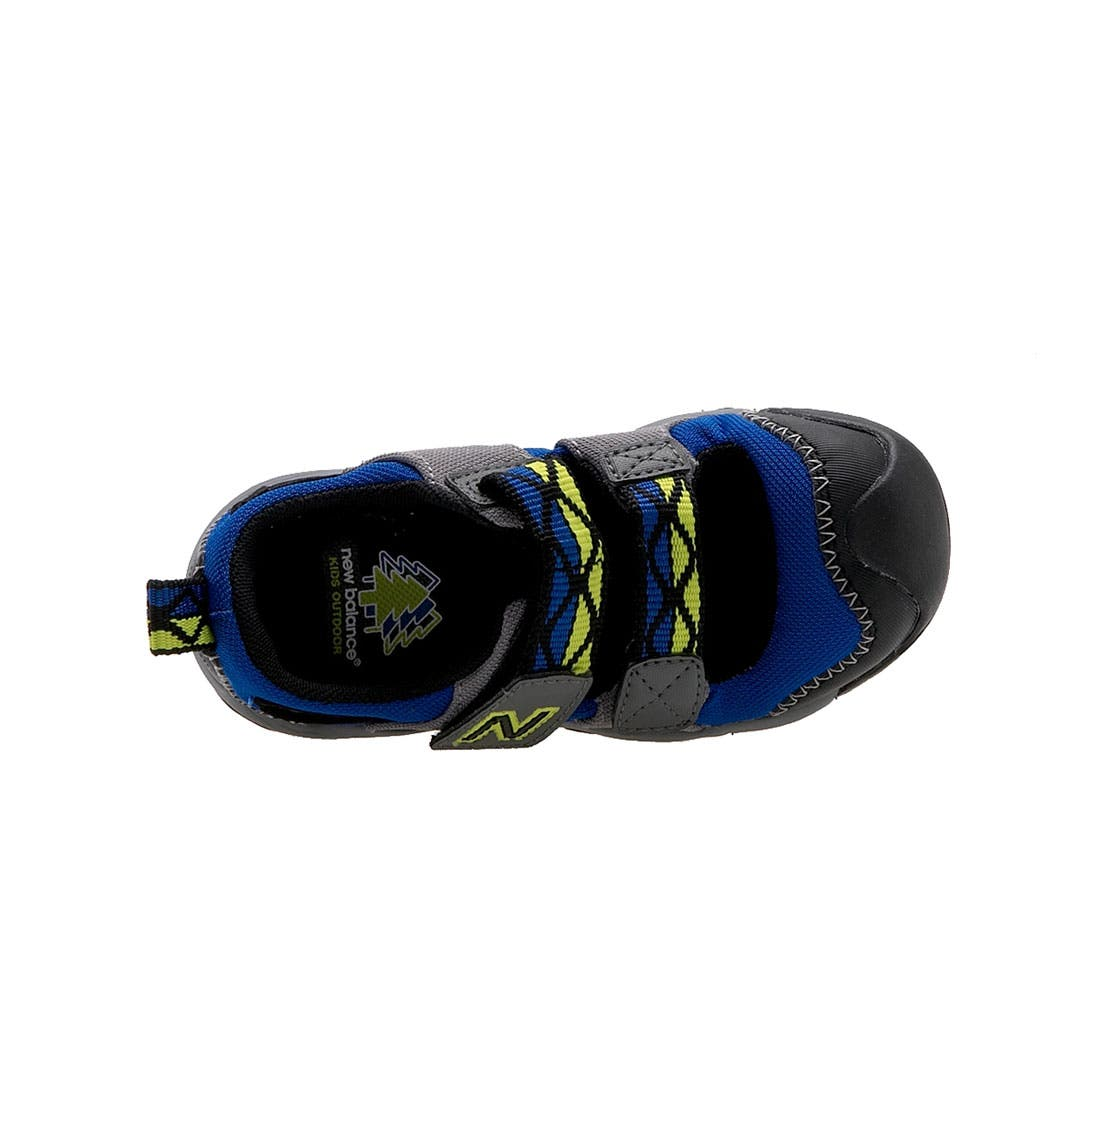 '553' Water Sandal,                             Alternate thumbnail 3, color,                             400